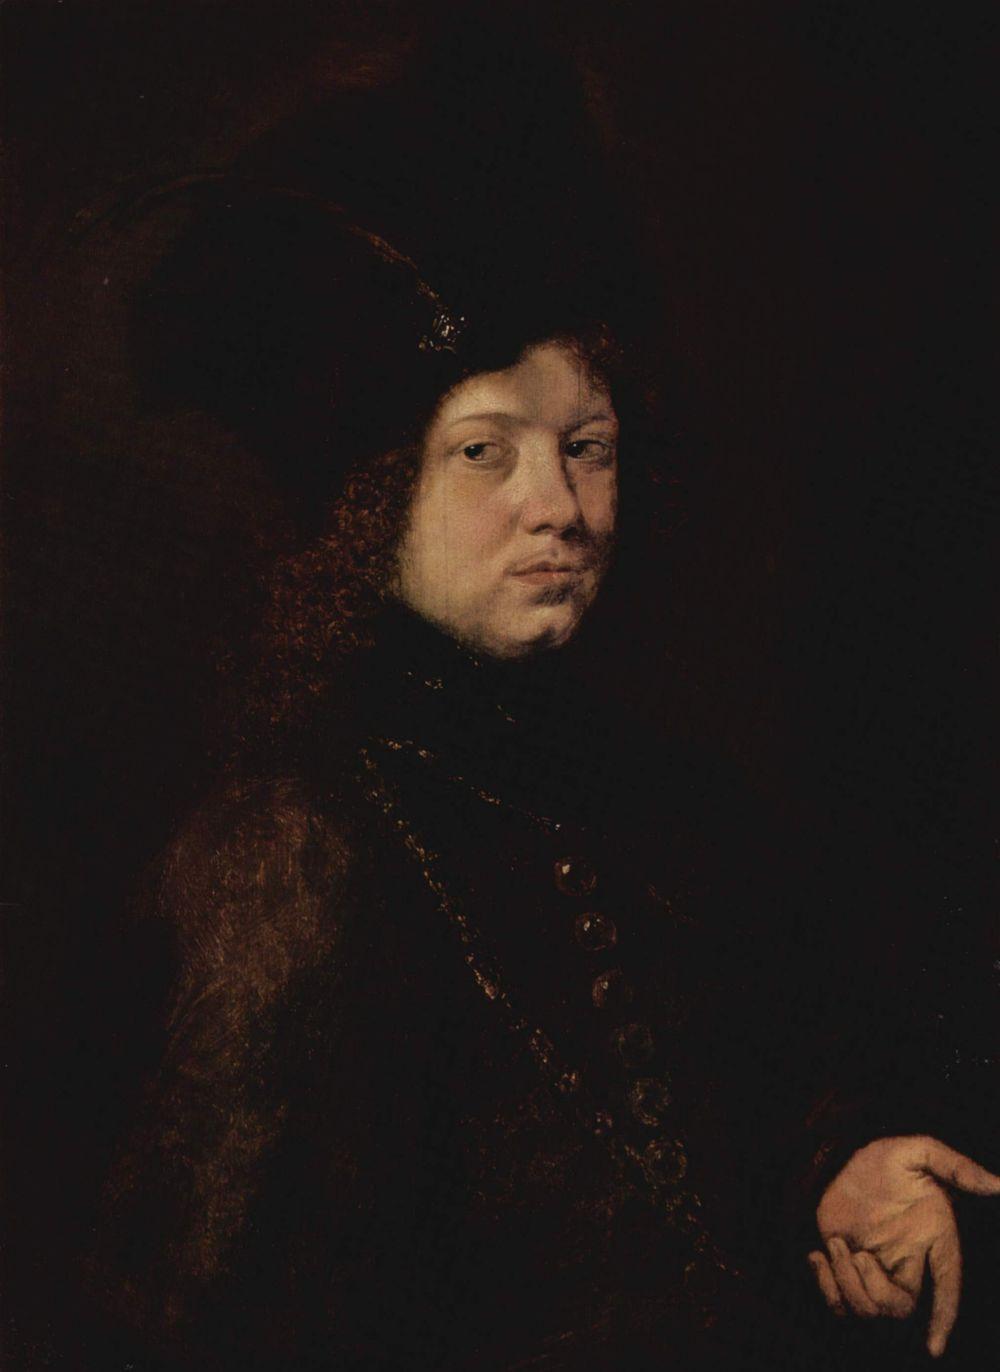 Paudis Christophe. Portrait of a young man